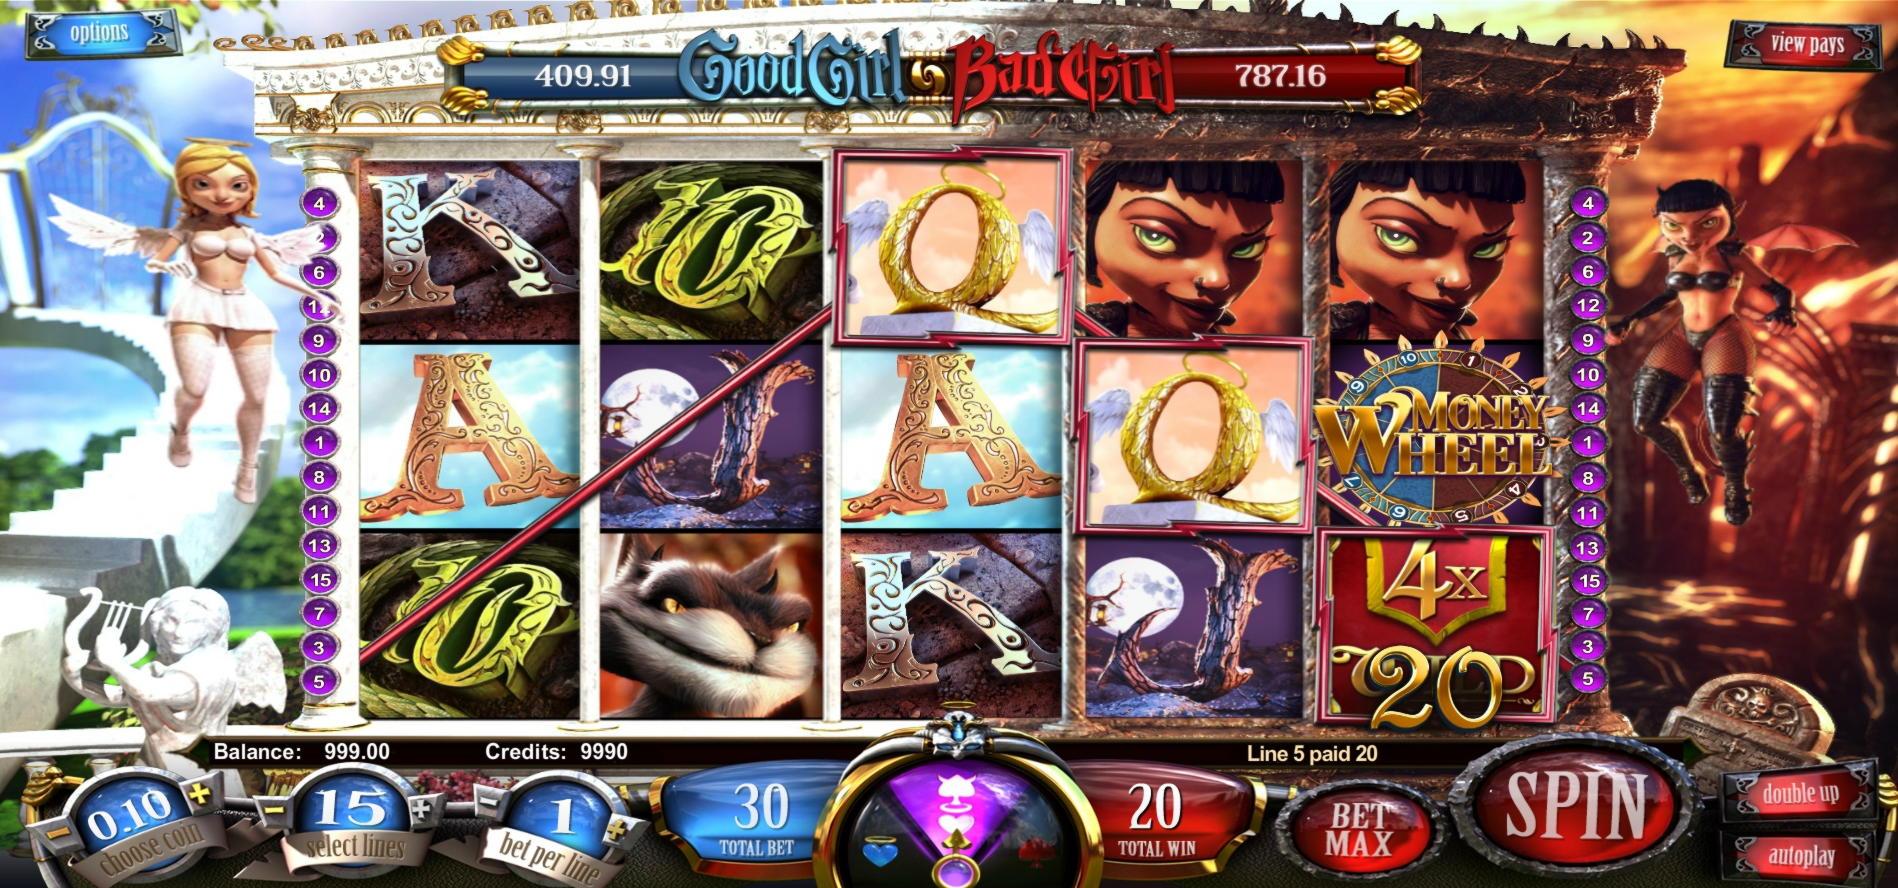 620٪ Match Bonus at Mansion Casino